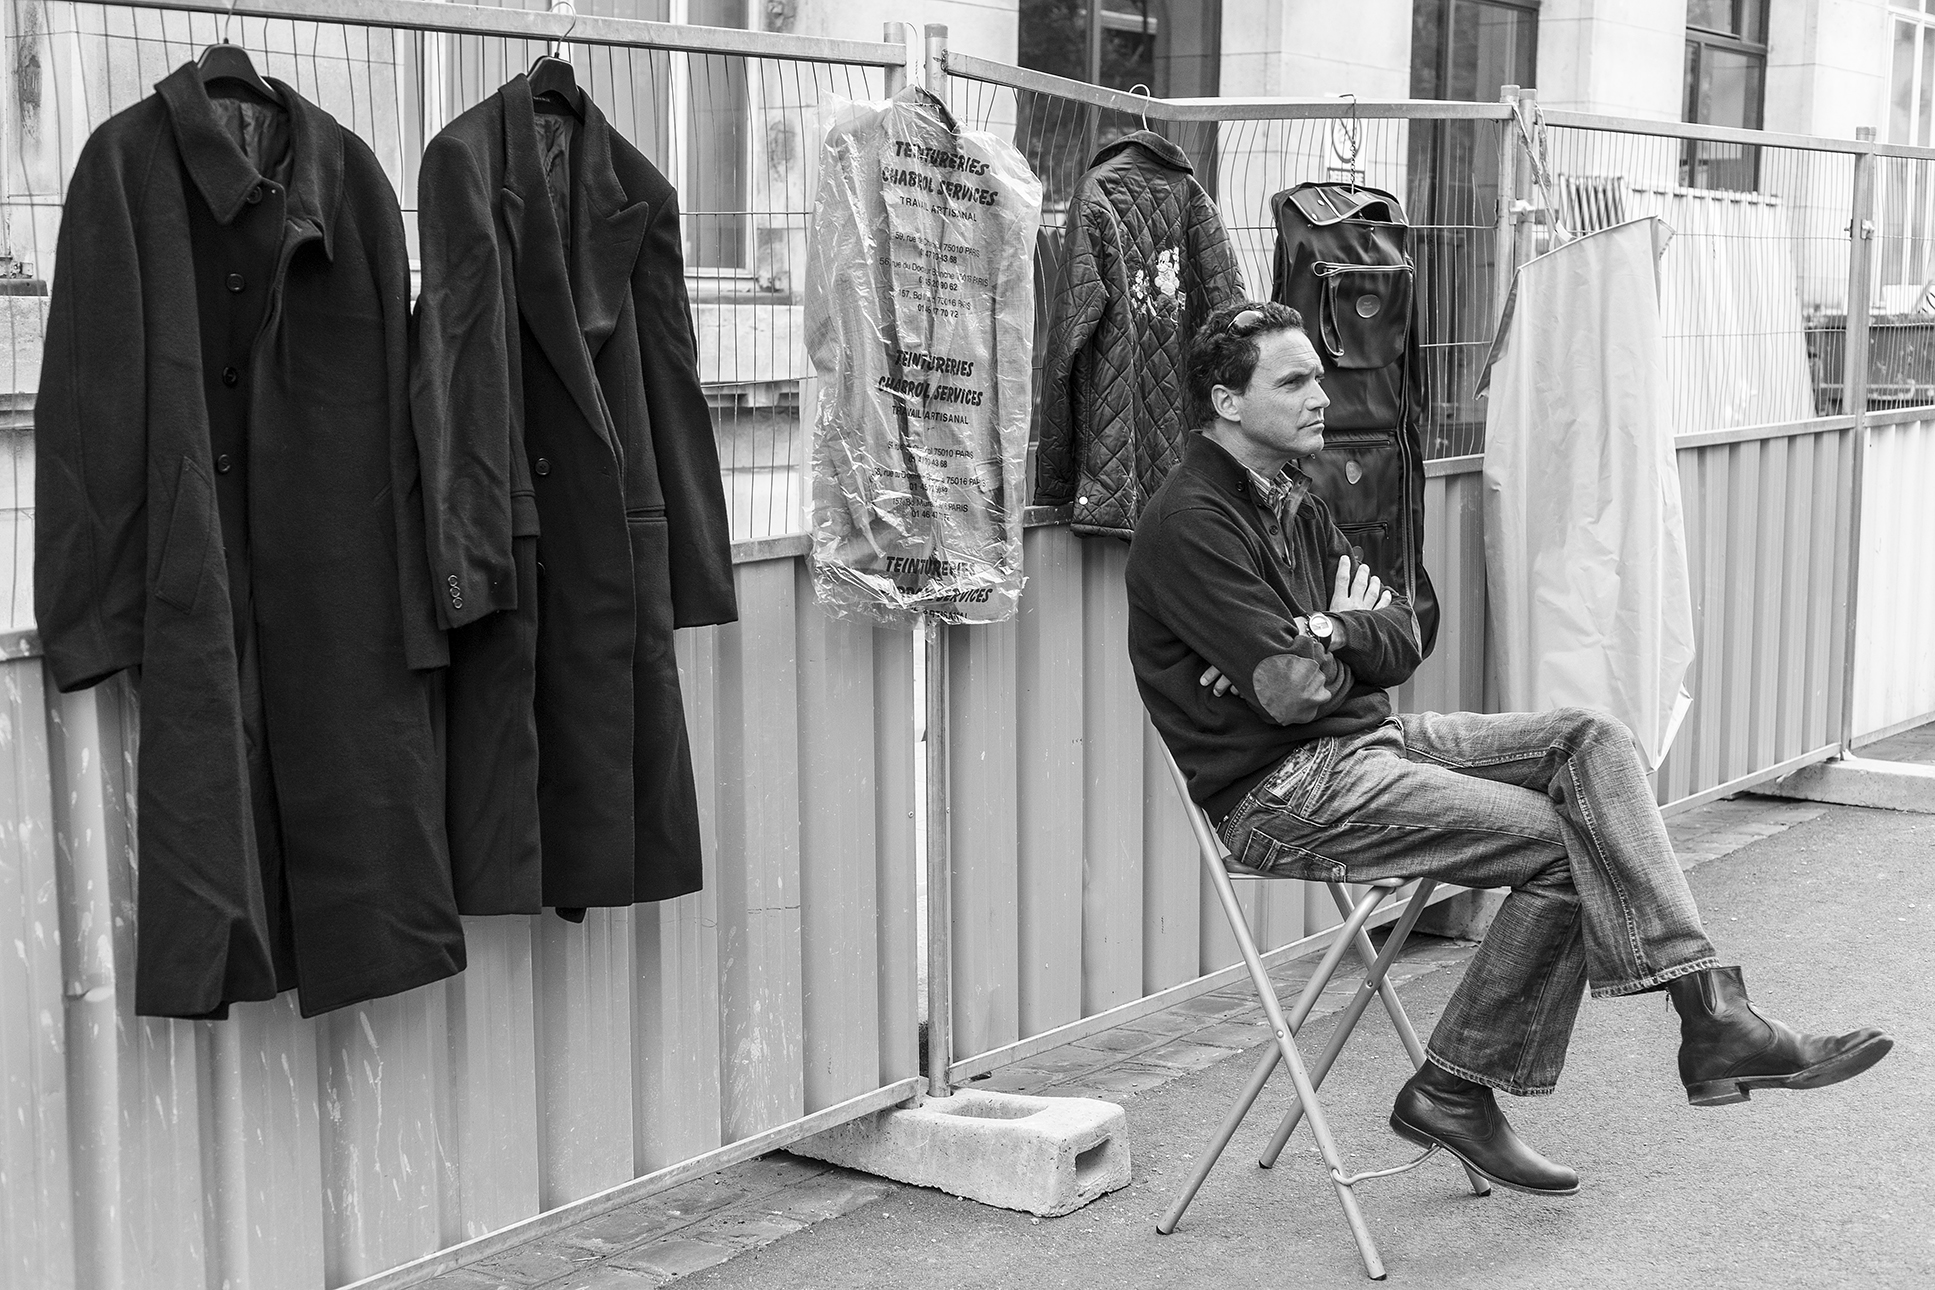 vendeur-Paris-mai-2011.jpg